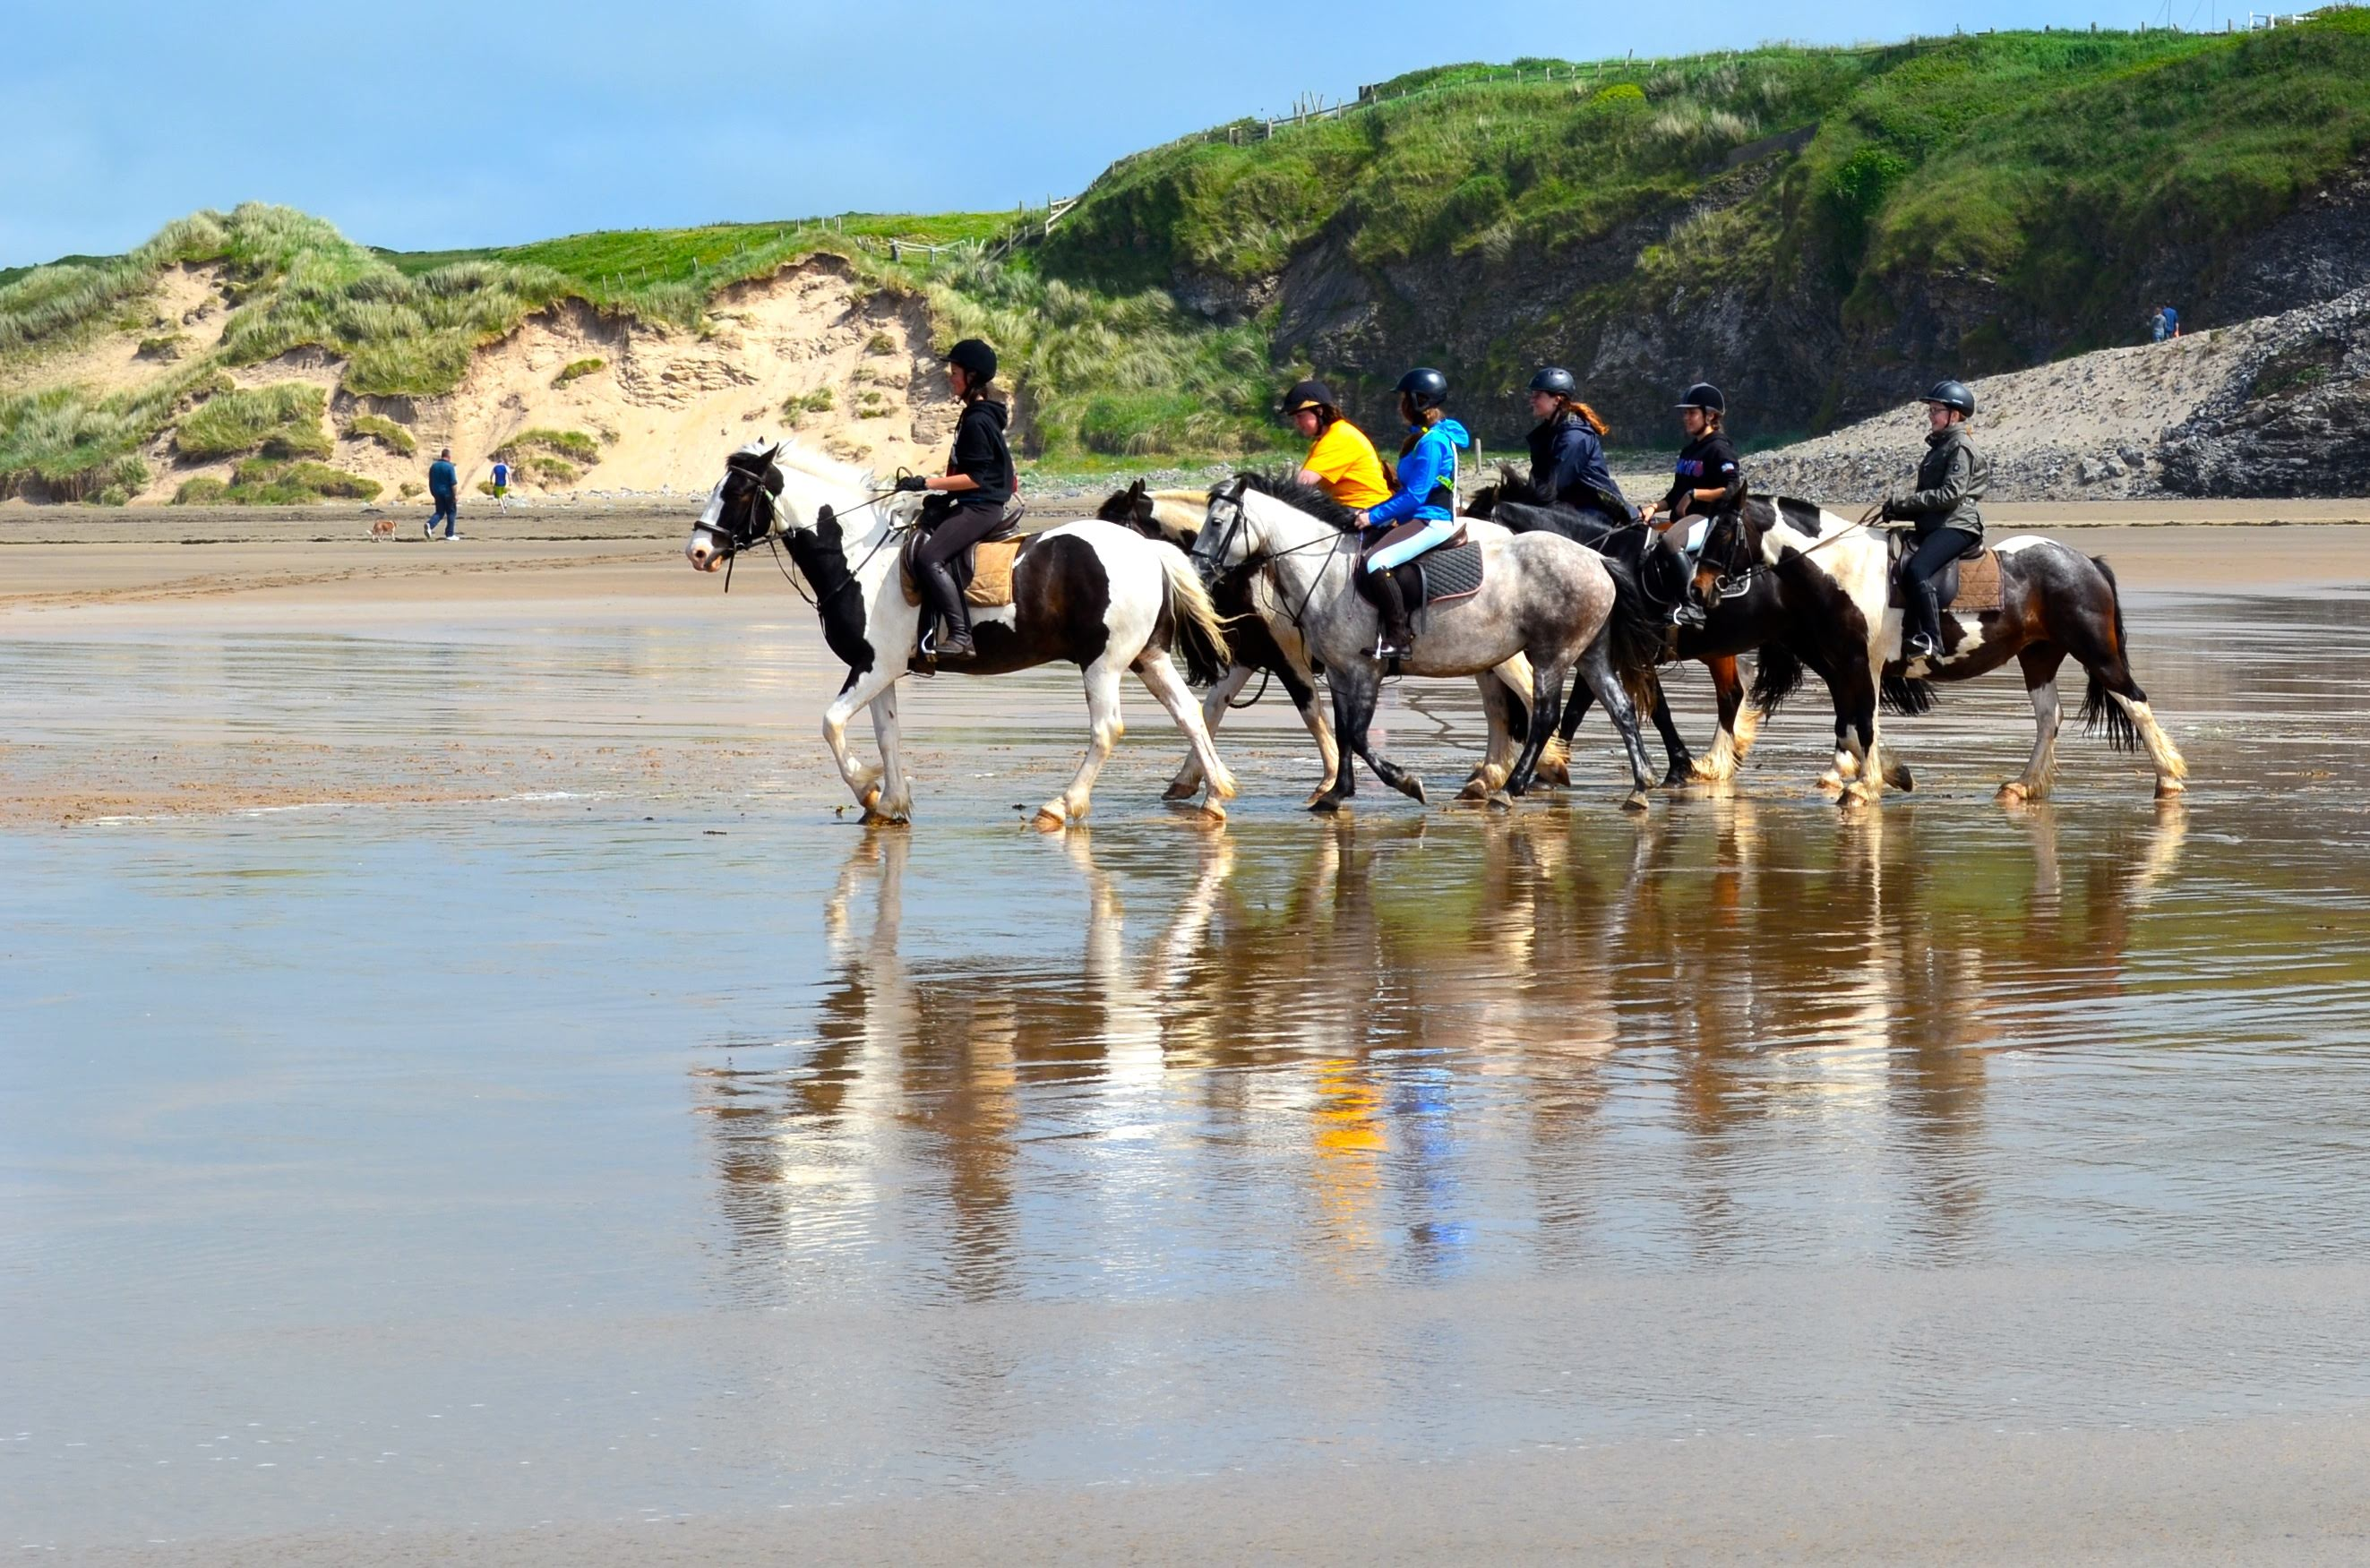 Horseriding on Tullan Strand - pic by Brittni Stasiuk